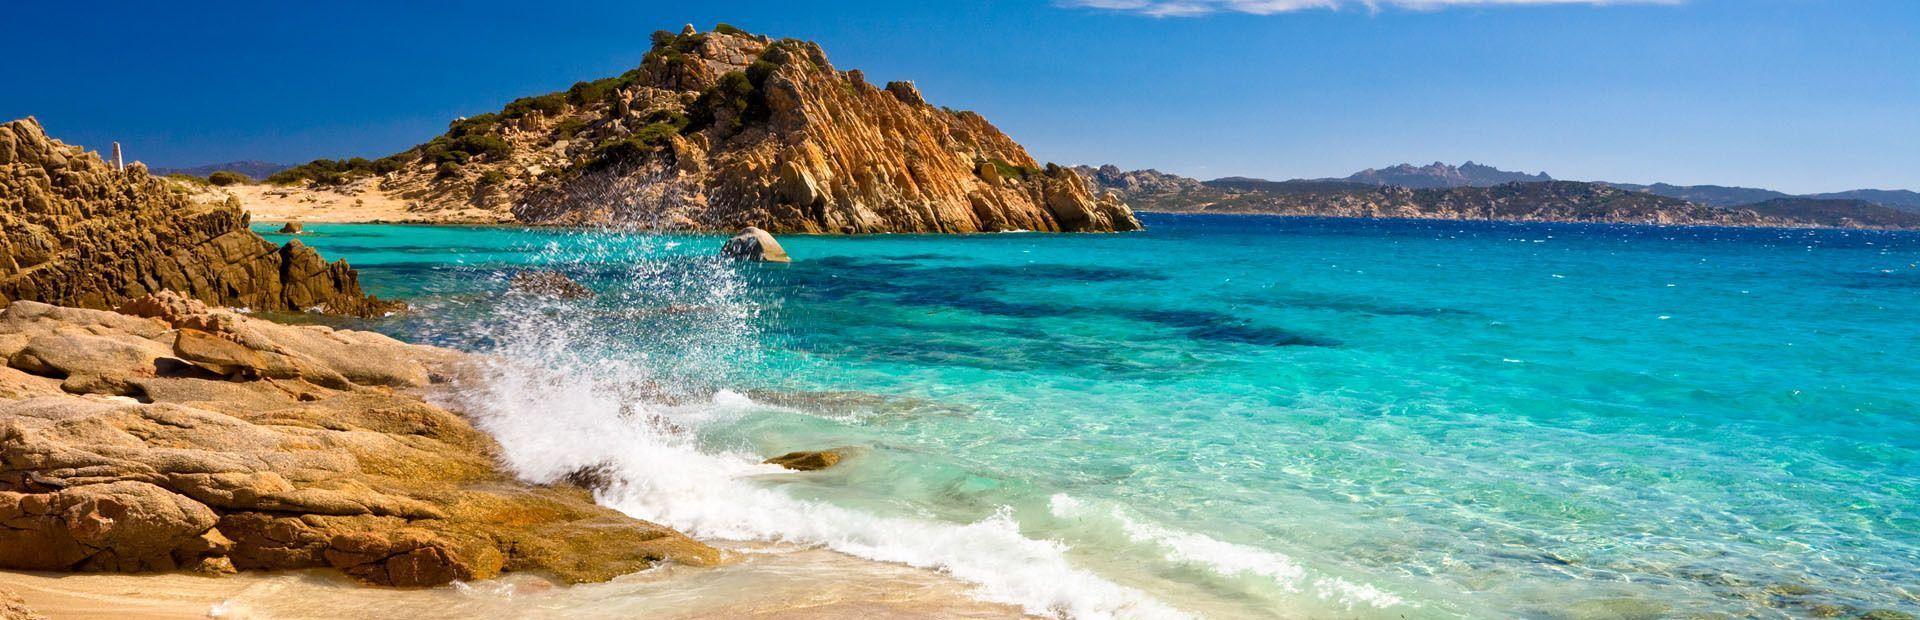 Sardegna Express: beach life in Costa Smeralda